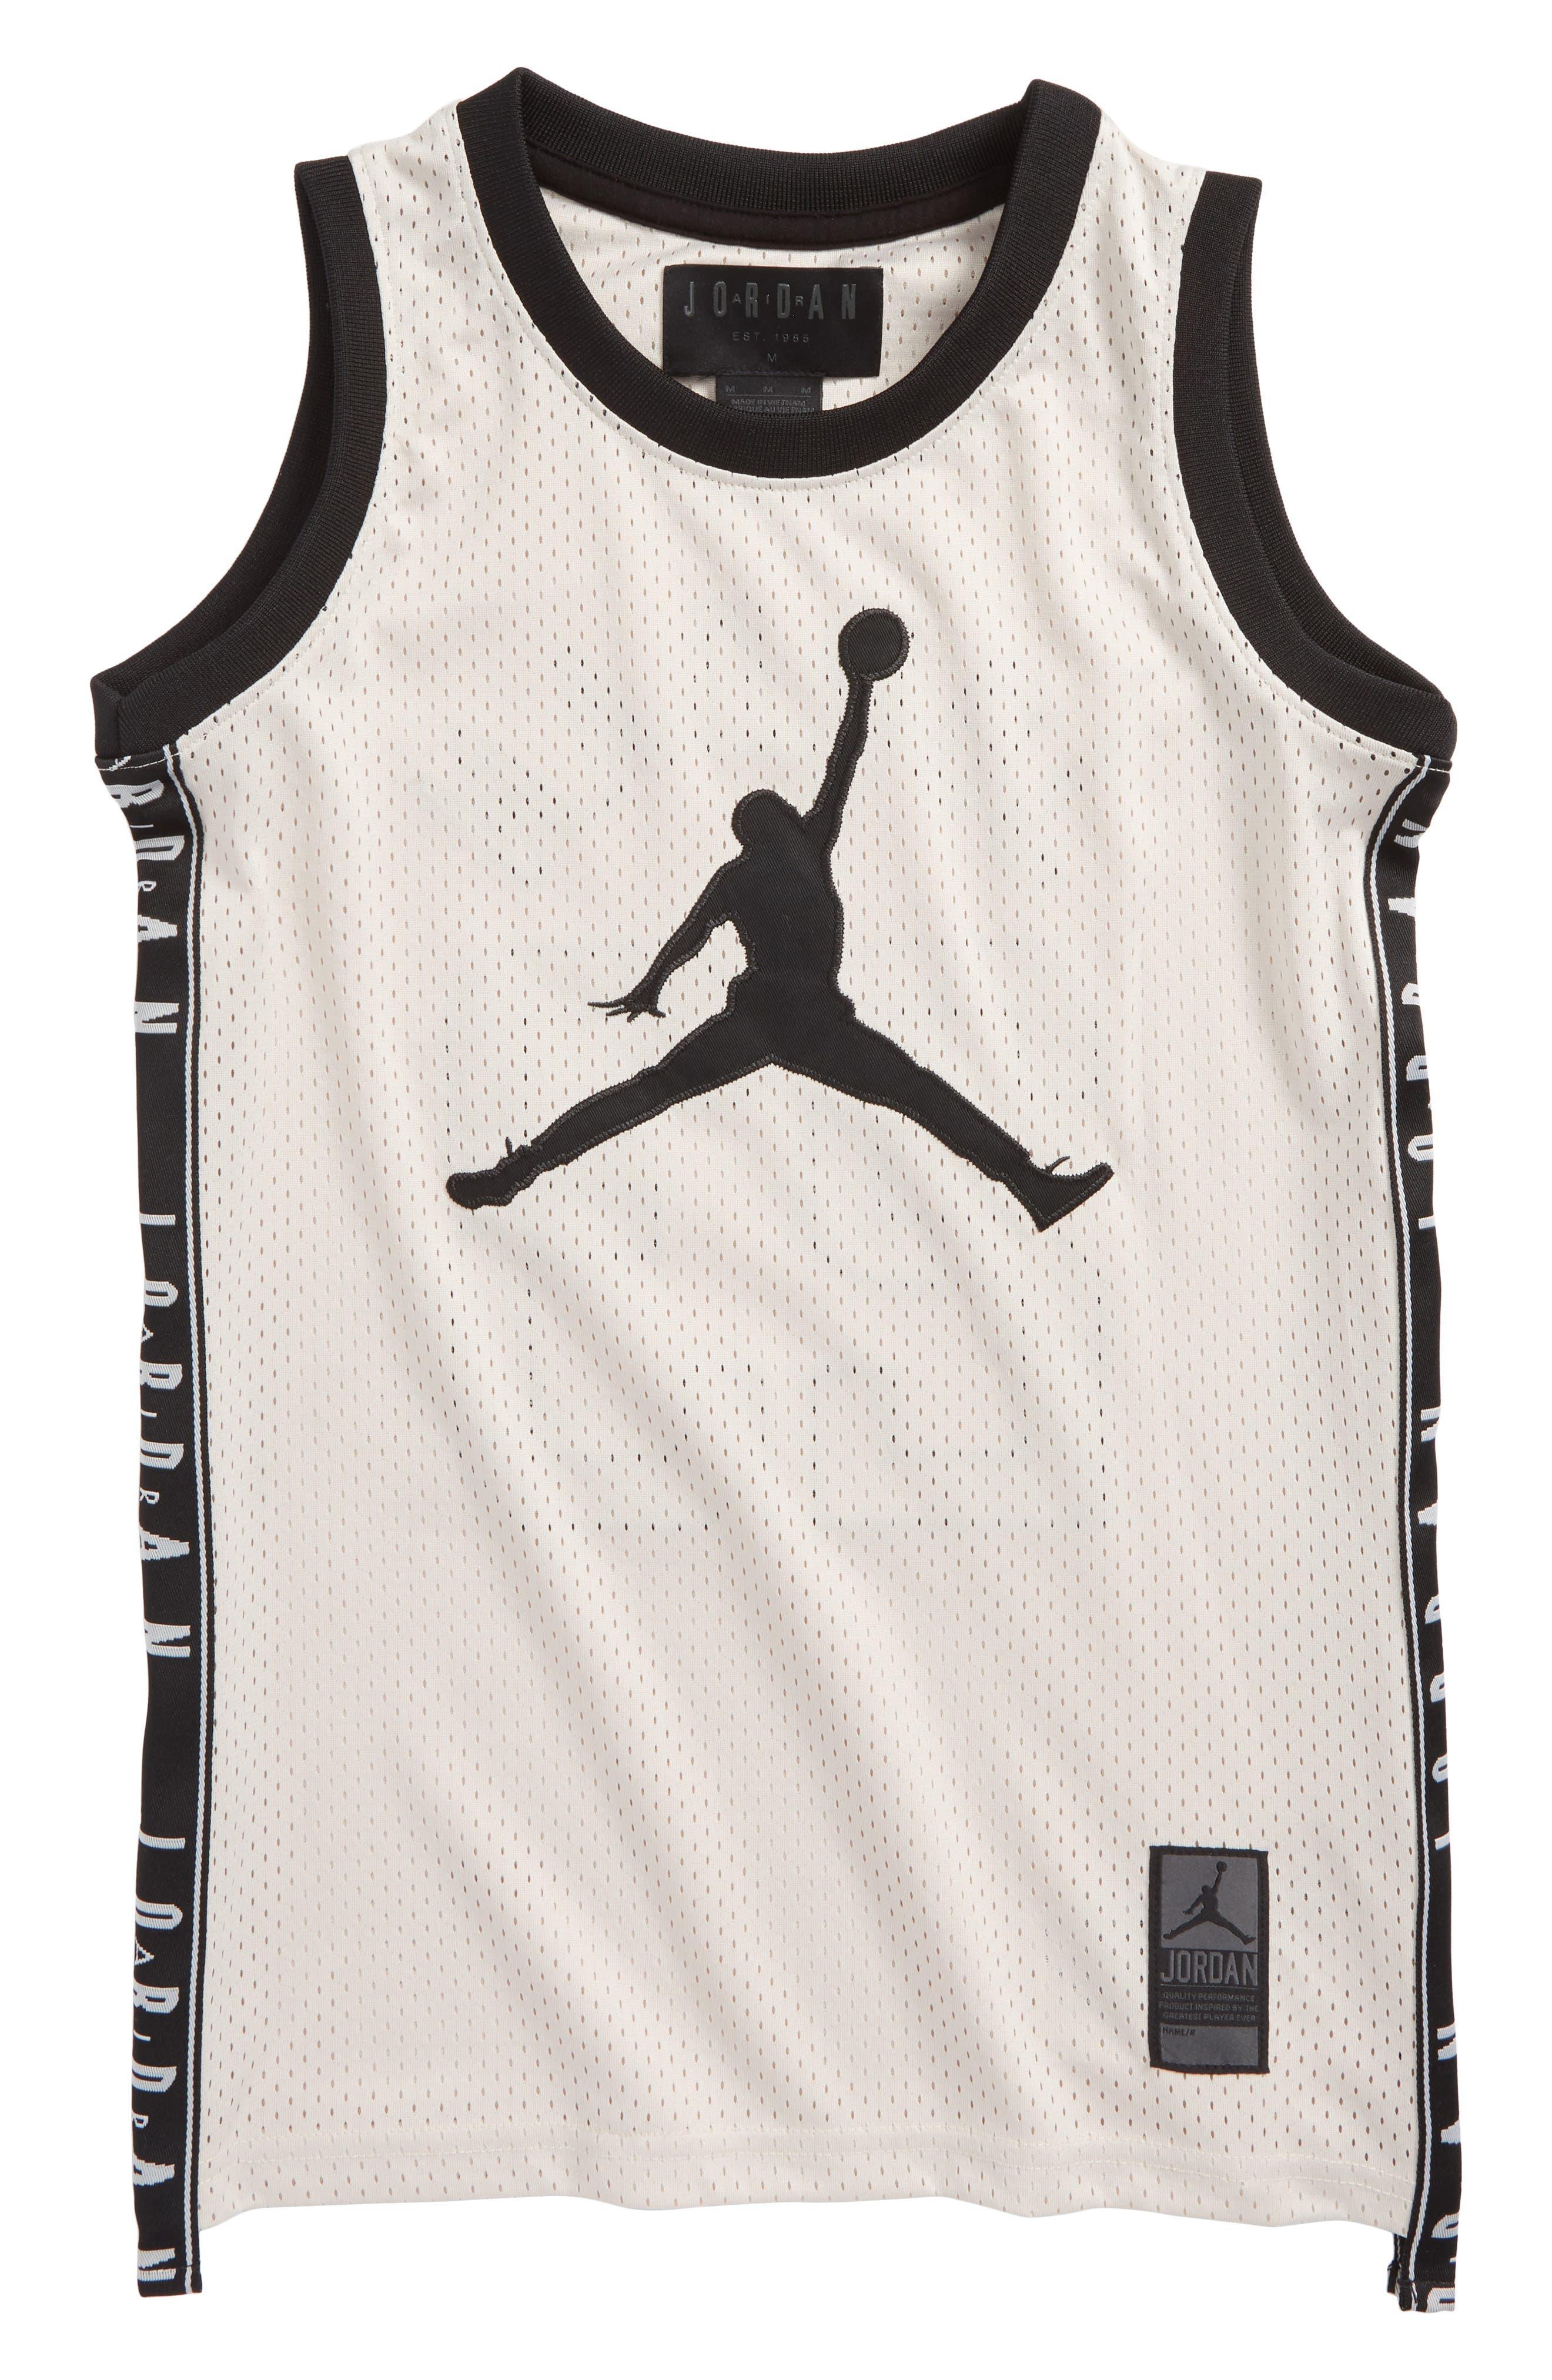 Jordan Rise Graphic Tape Jersey,                         Main,                         color, 281